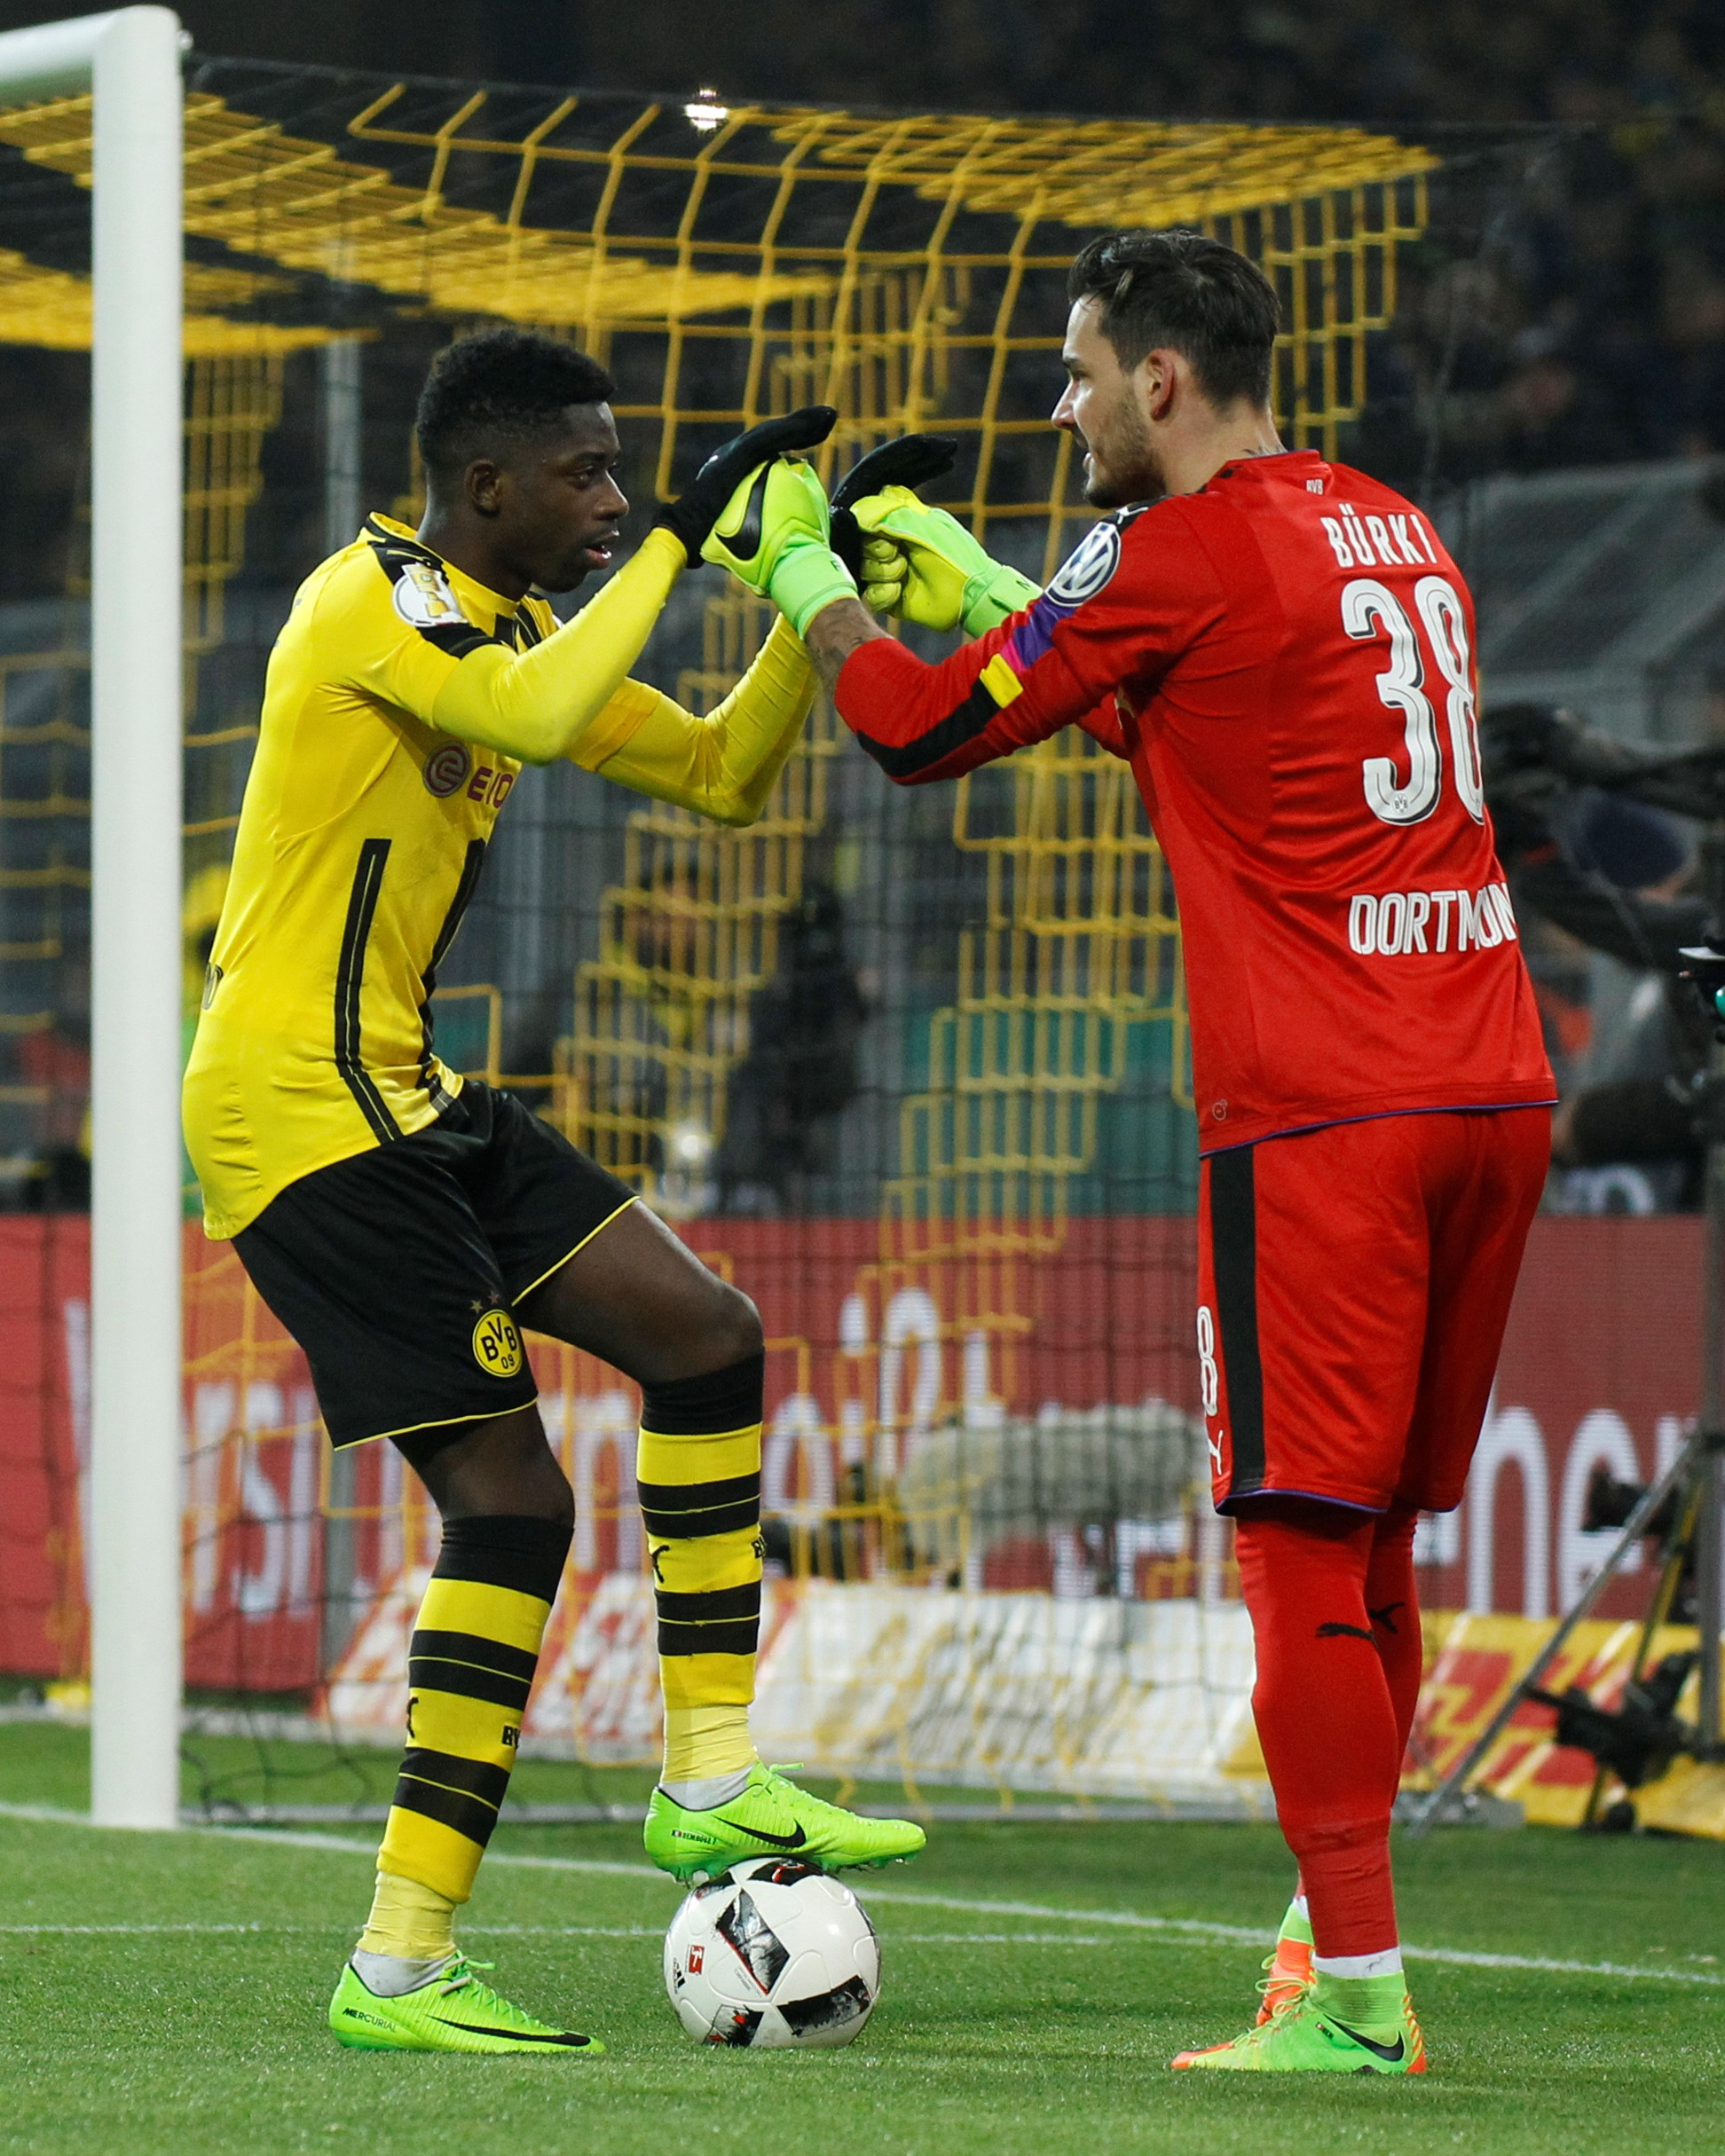 Dortmund Berlin Dfb Pokal